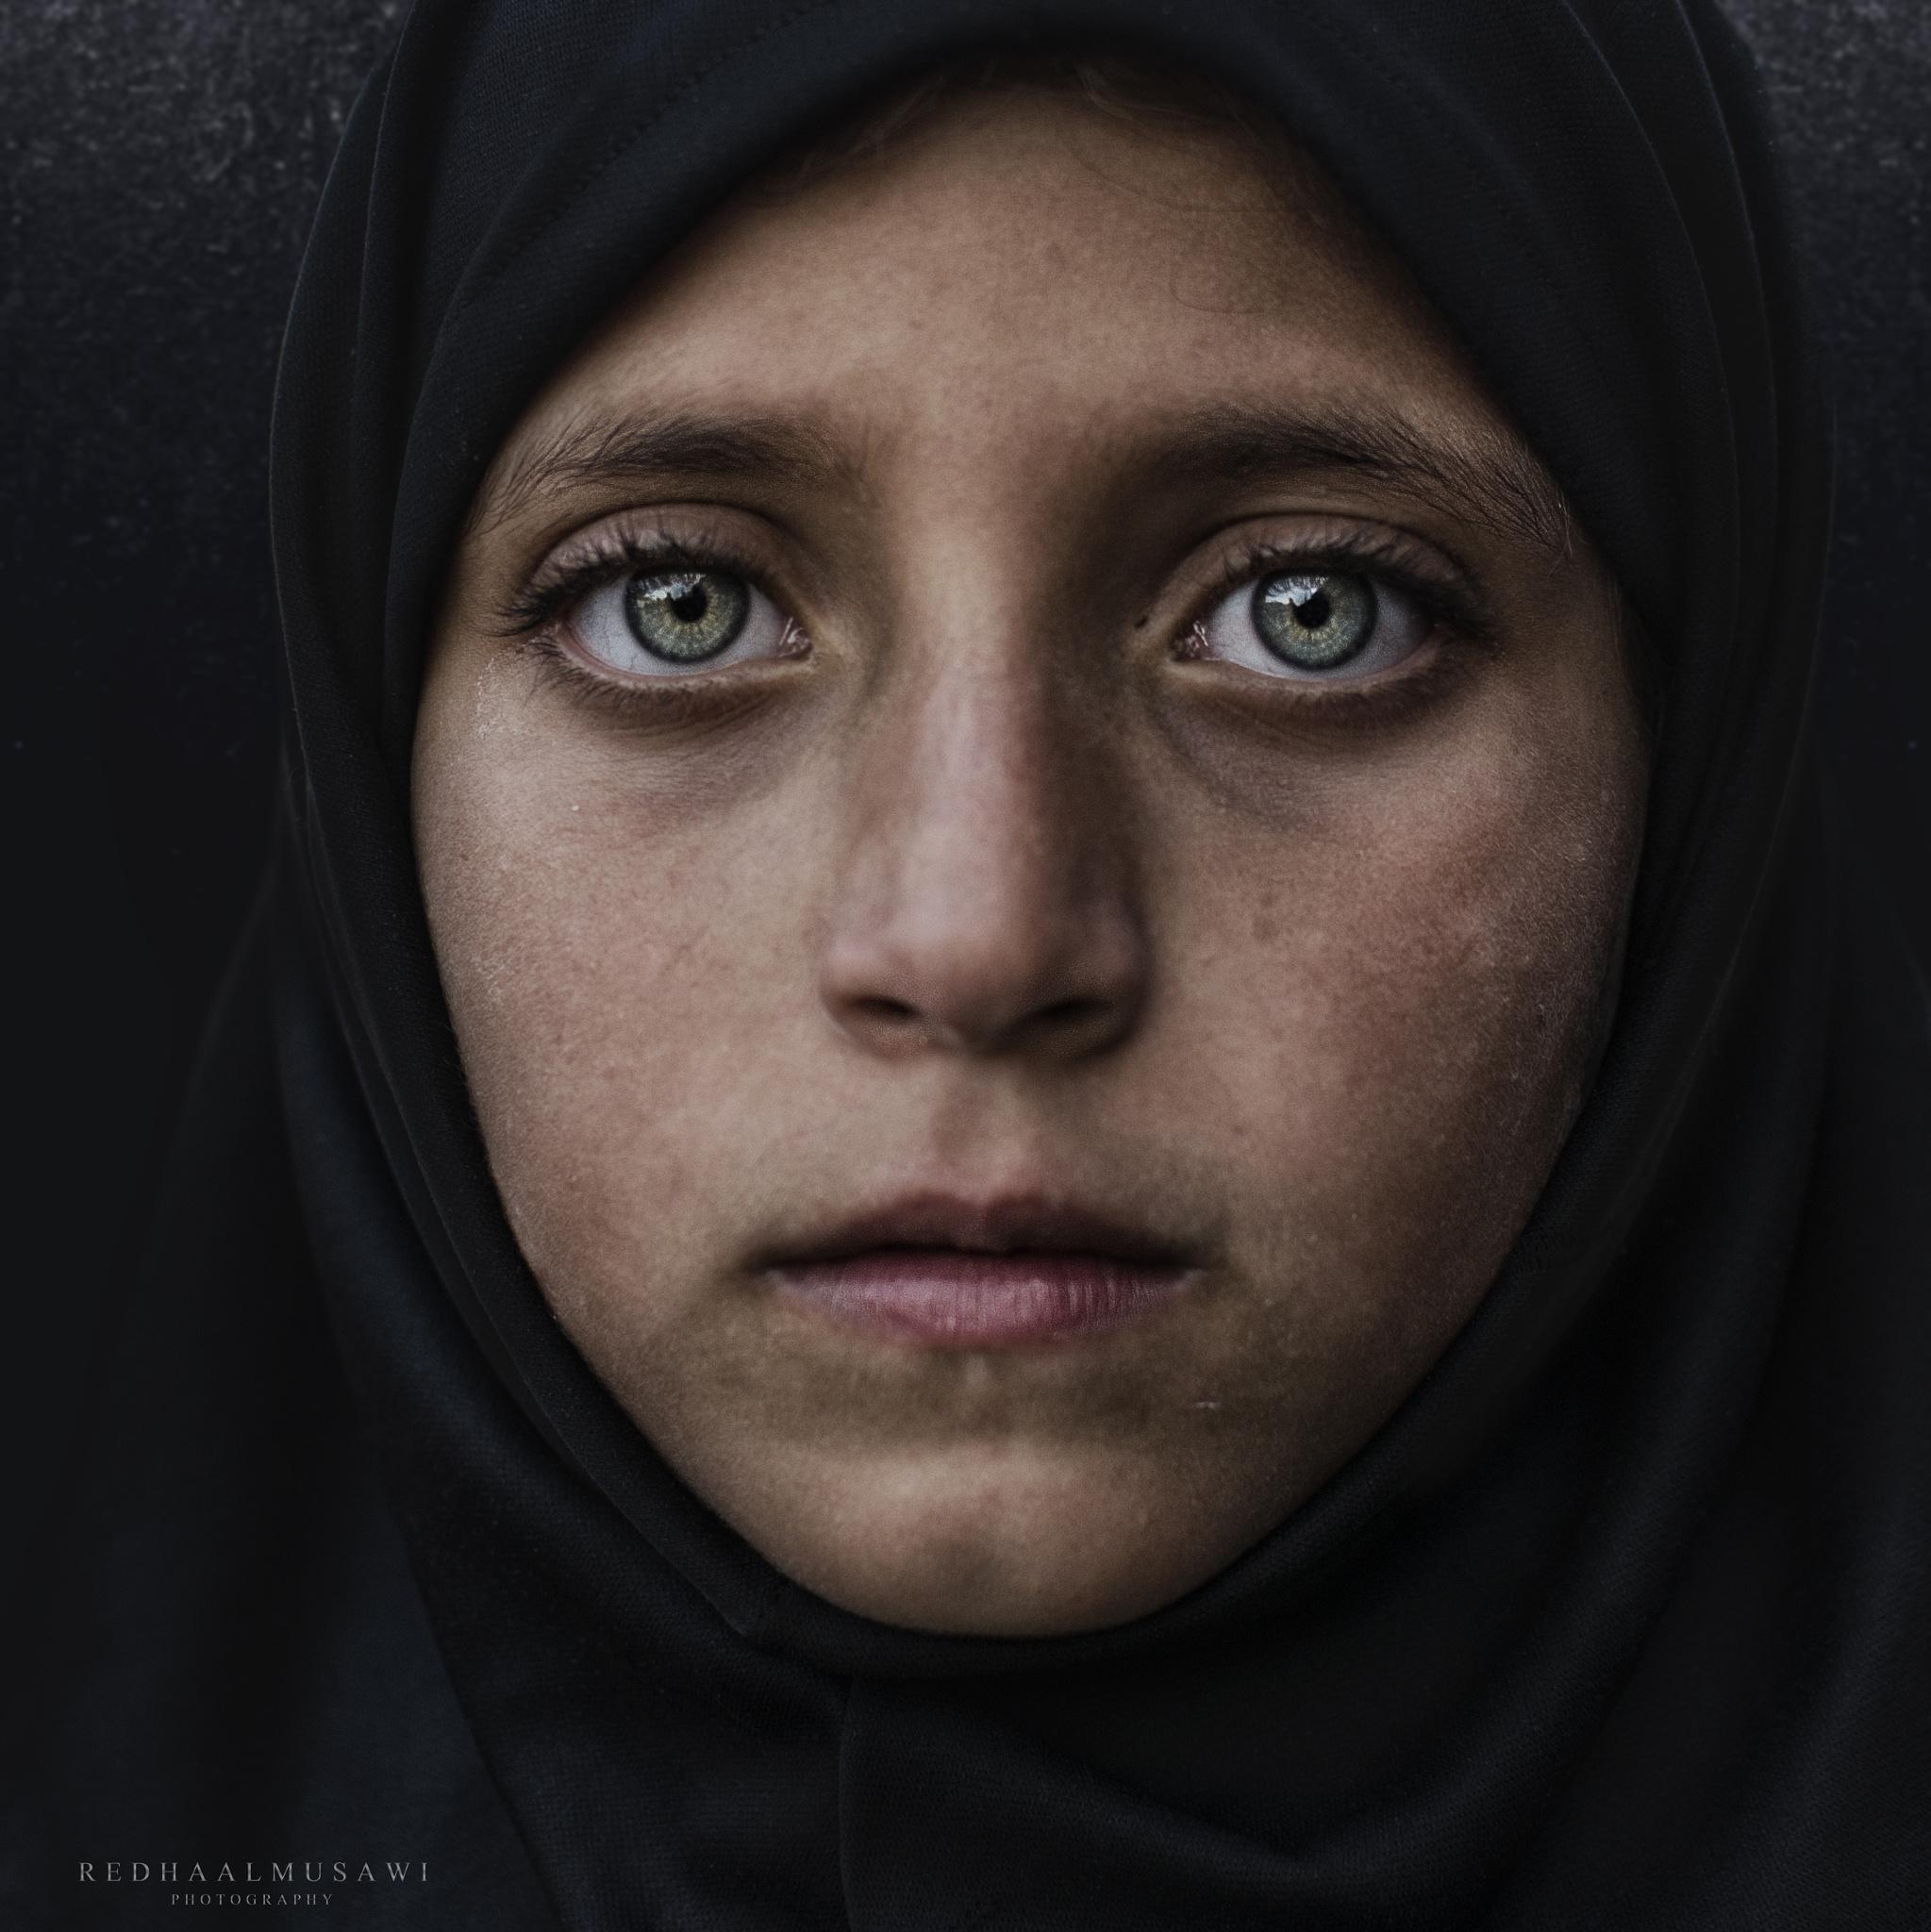 portrait Muslim girl | Portraits (color) | Pinterest | Muslim girls ...